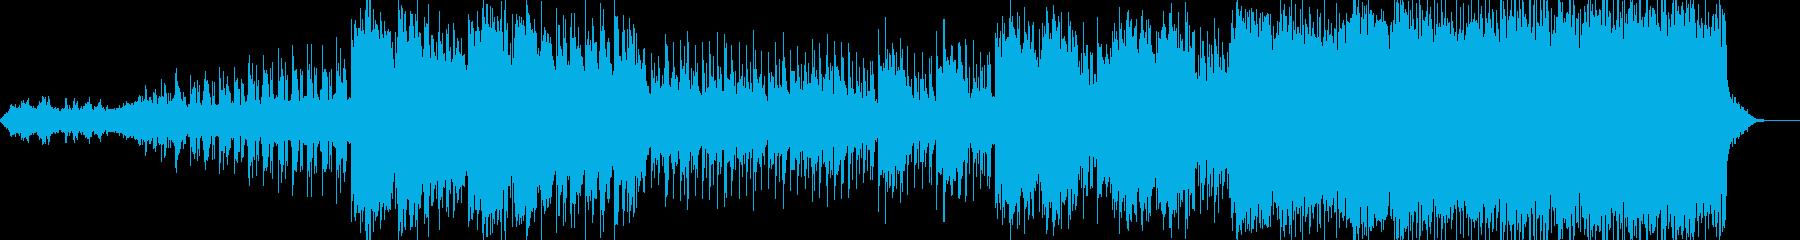 Mantraの再生済みの波形